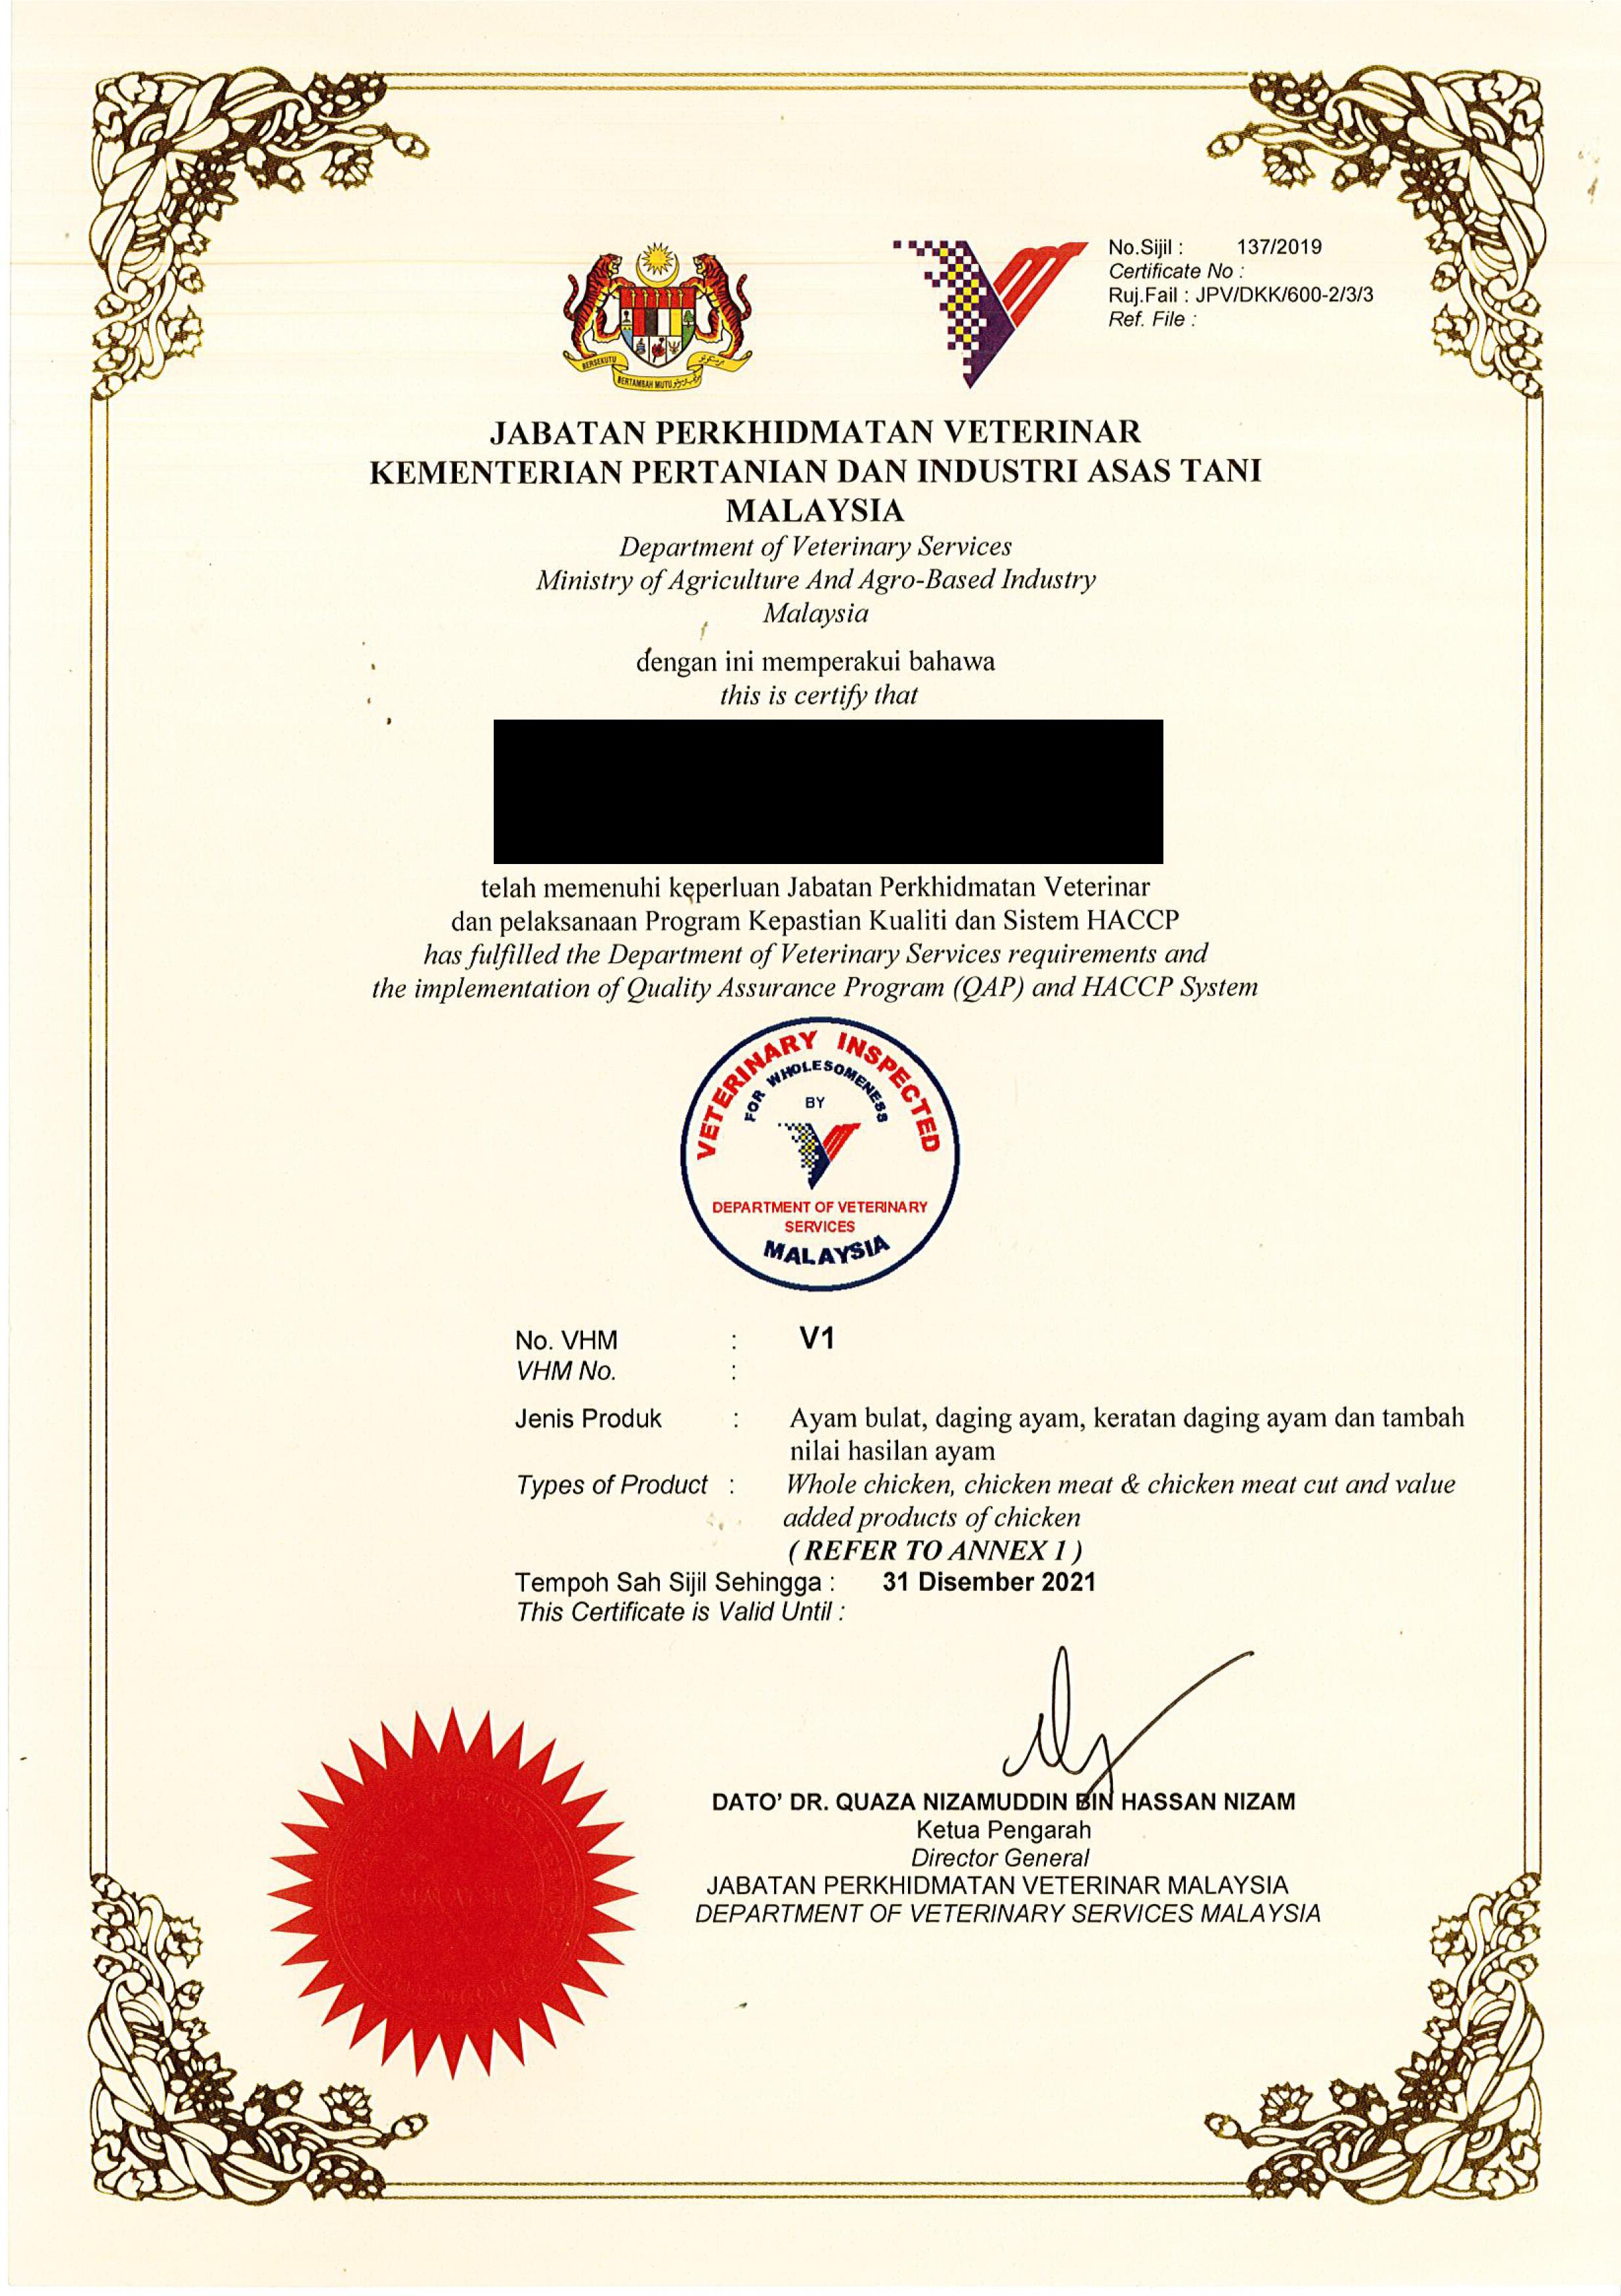 Veterinary Health Mark Certificate